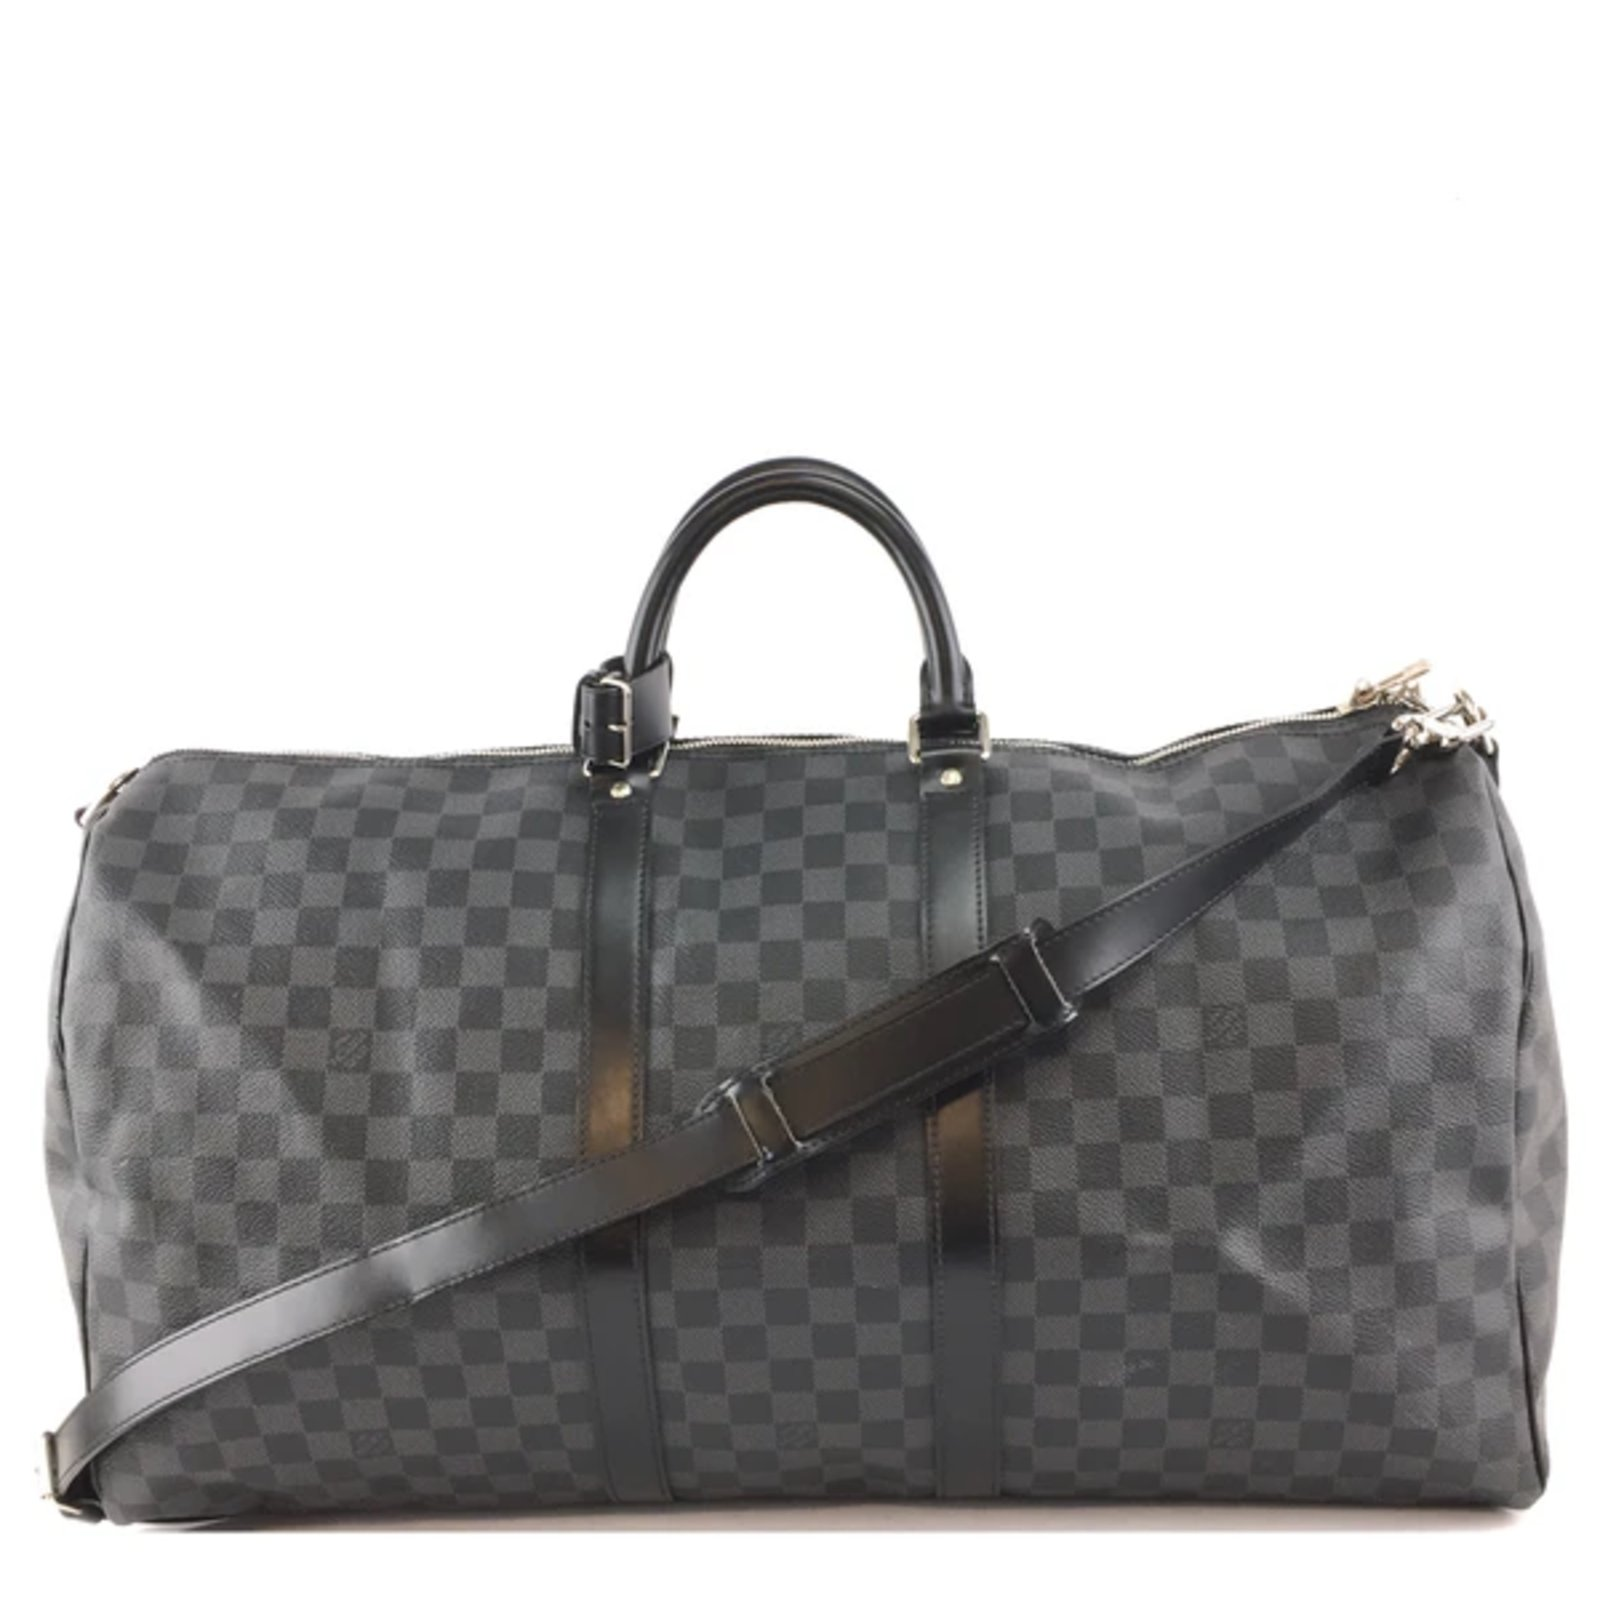 Louis Vuitton Keepall Bandouliere 55 Toile Damier Graphite